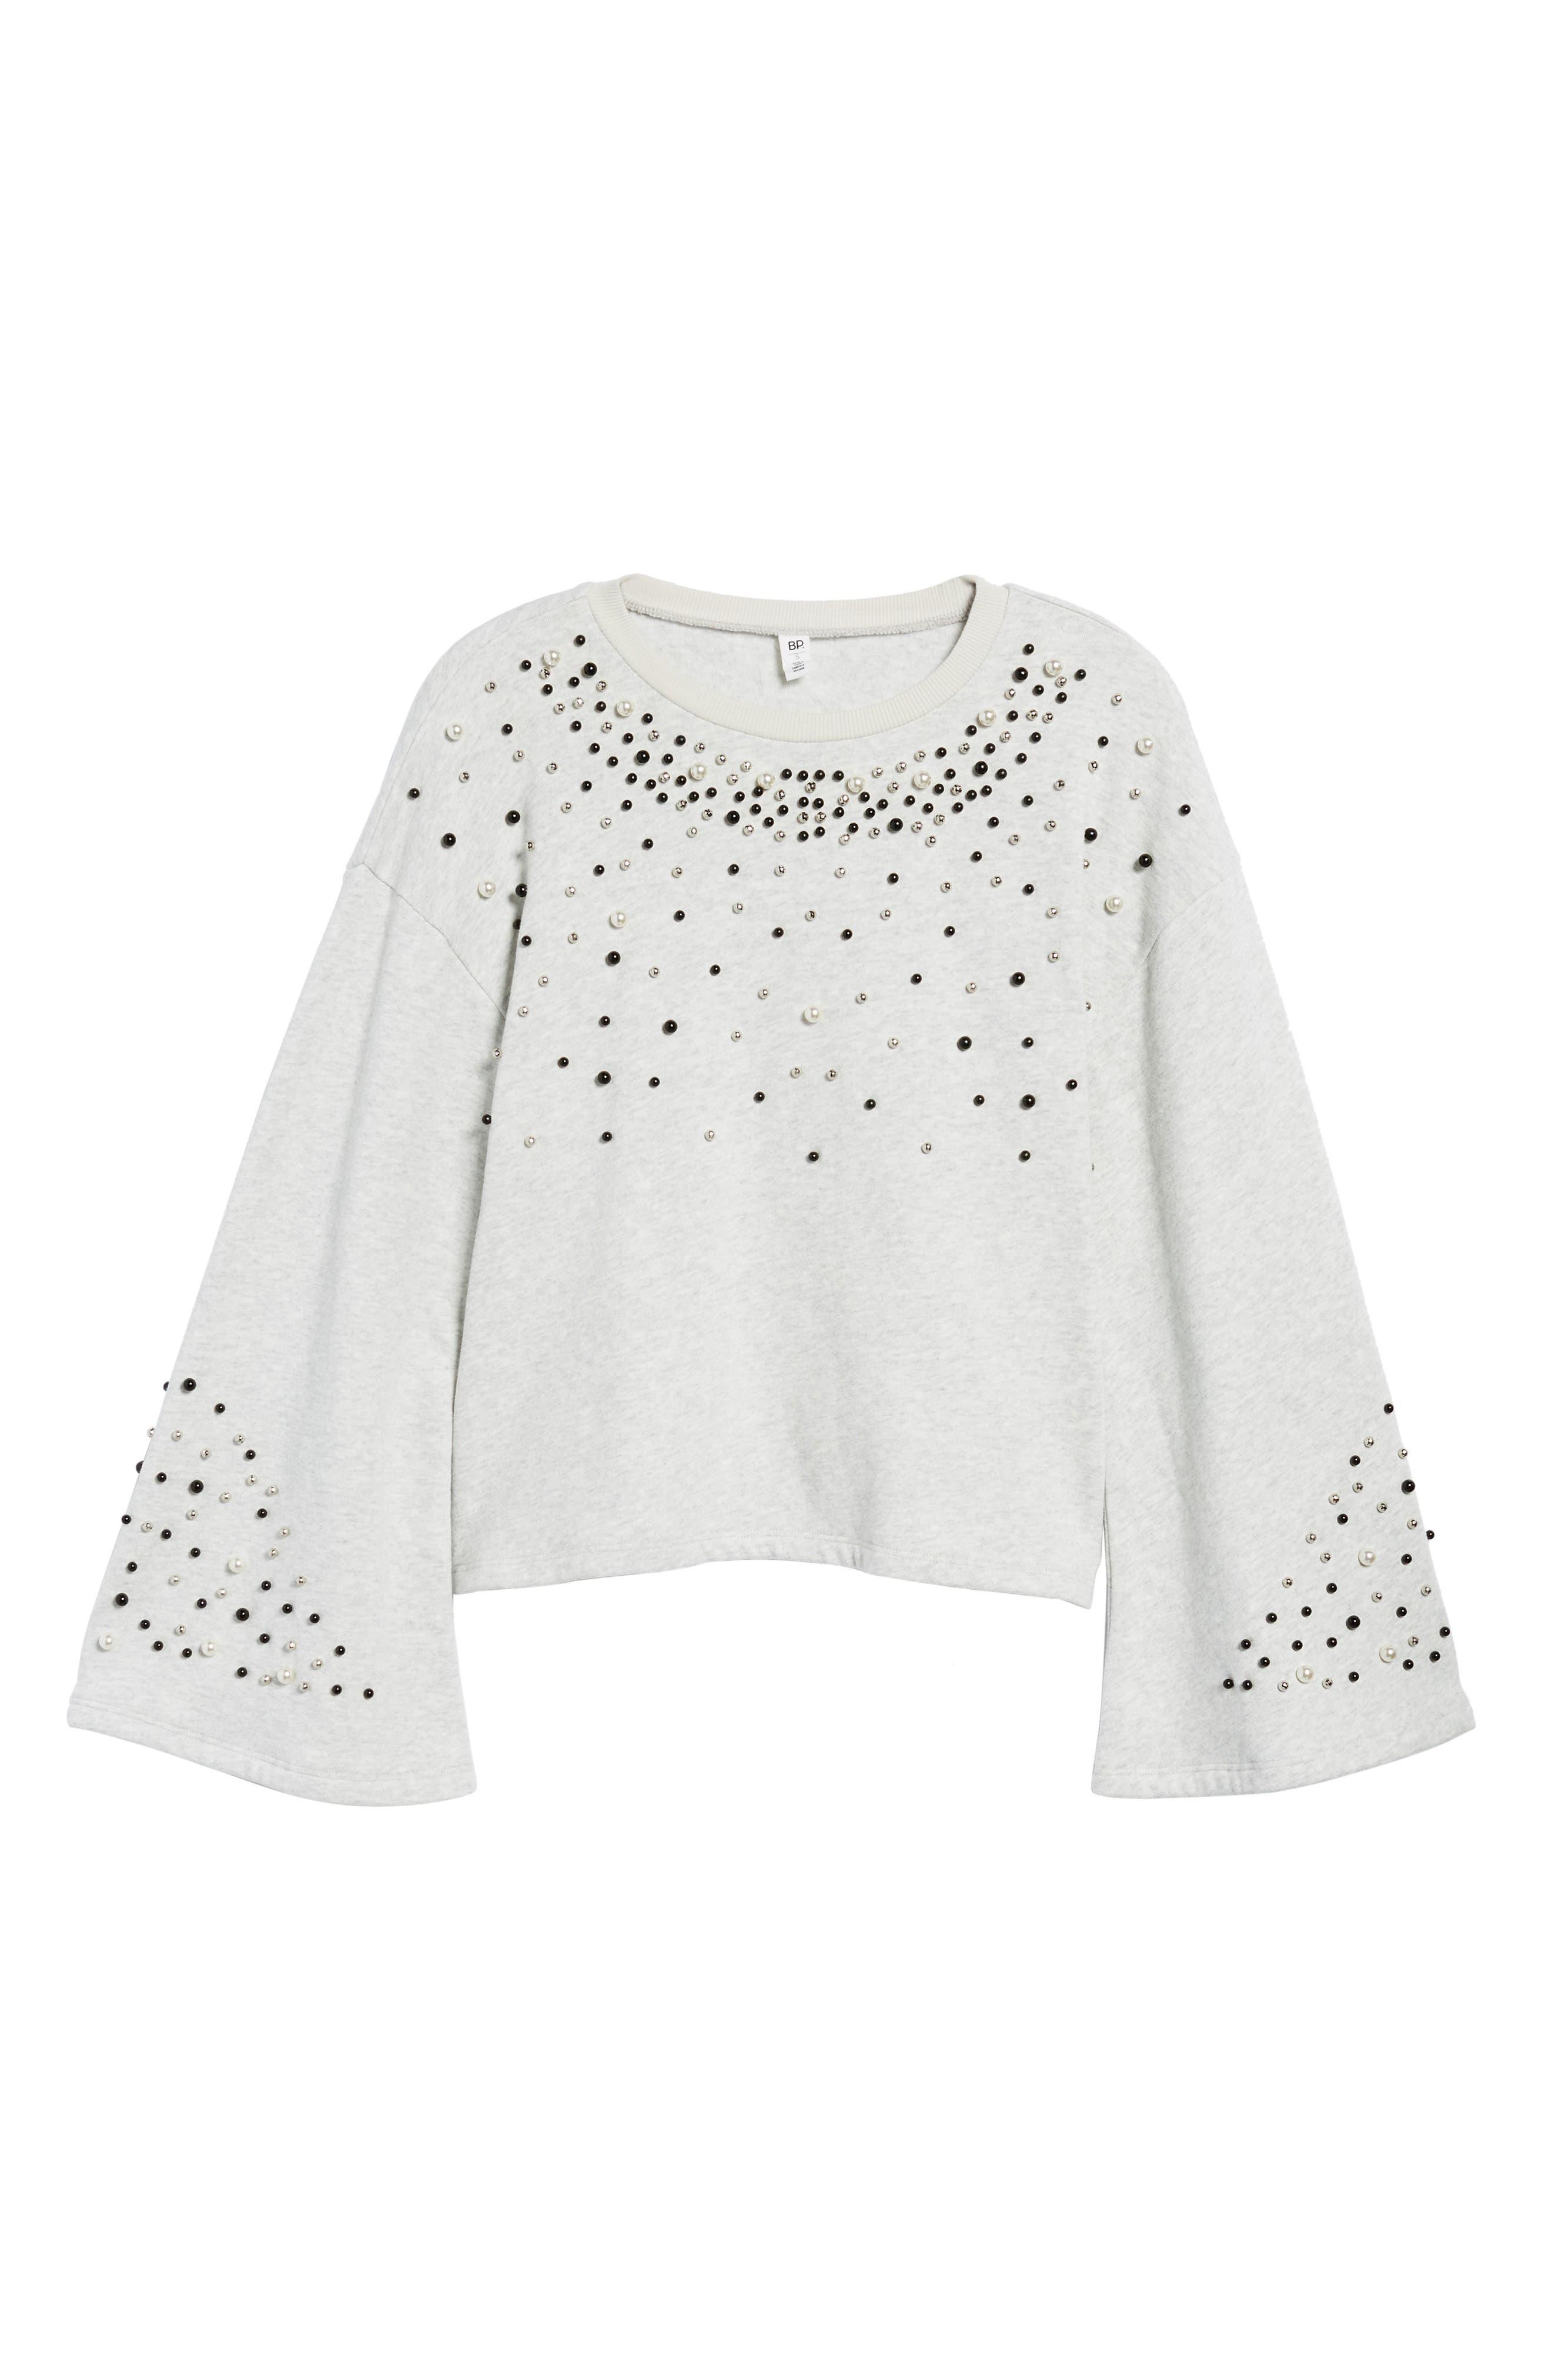 Embellished Bell Sleeve Sweatshirt,                             Alternate thumbnail 6, color,                             050